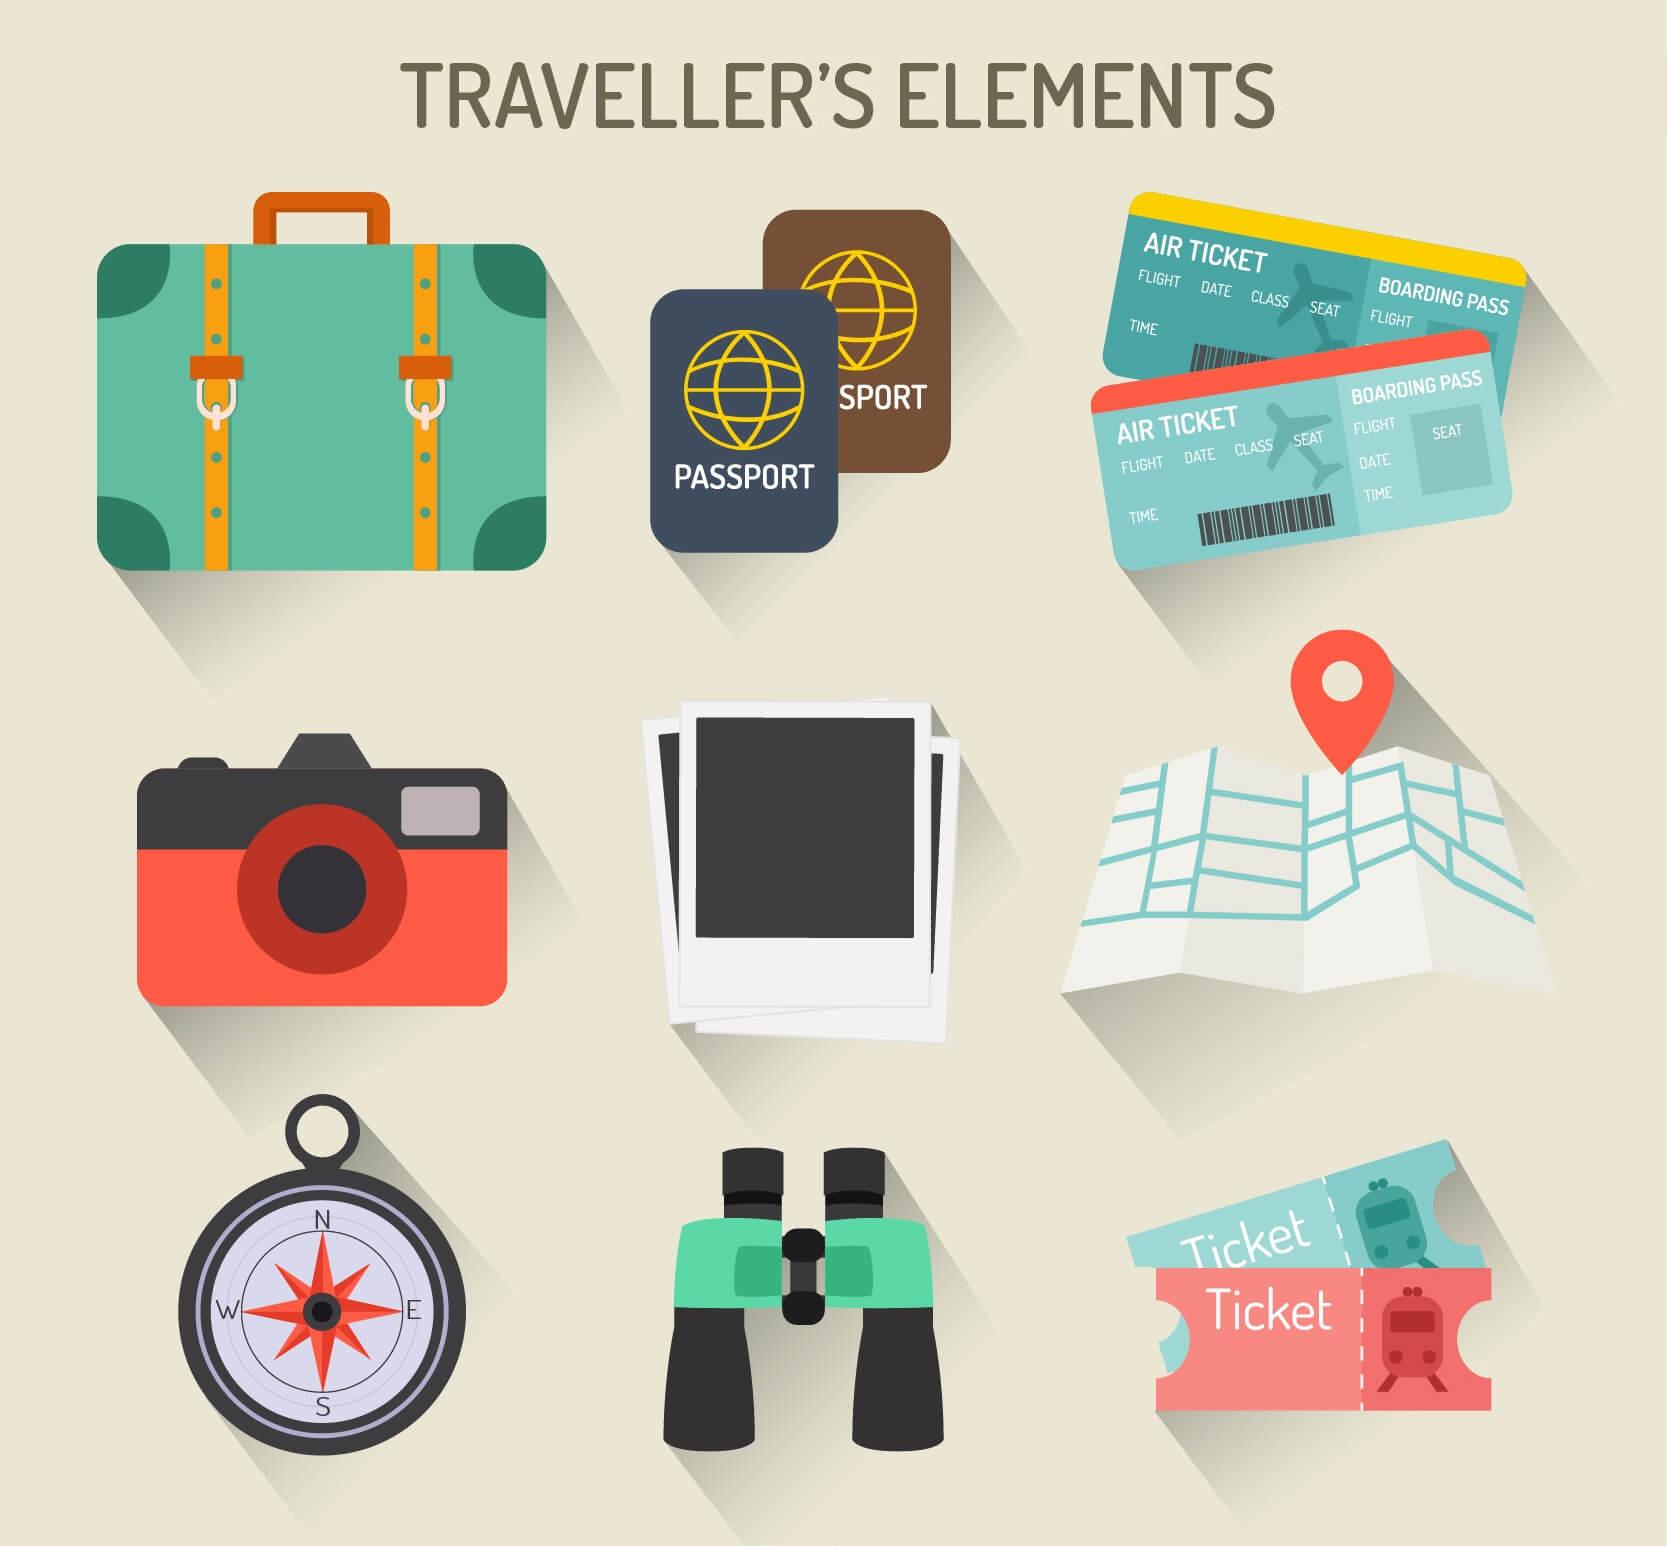 Traveller's Essentials